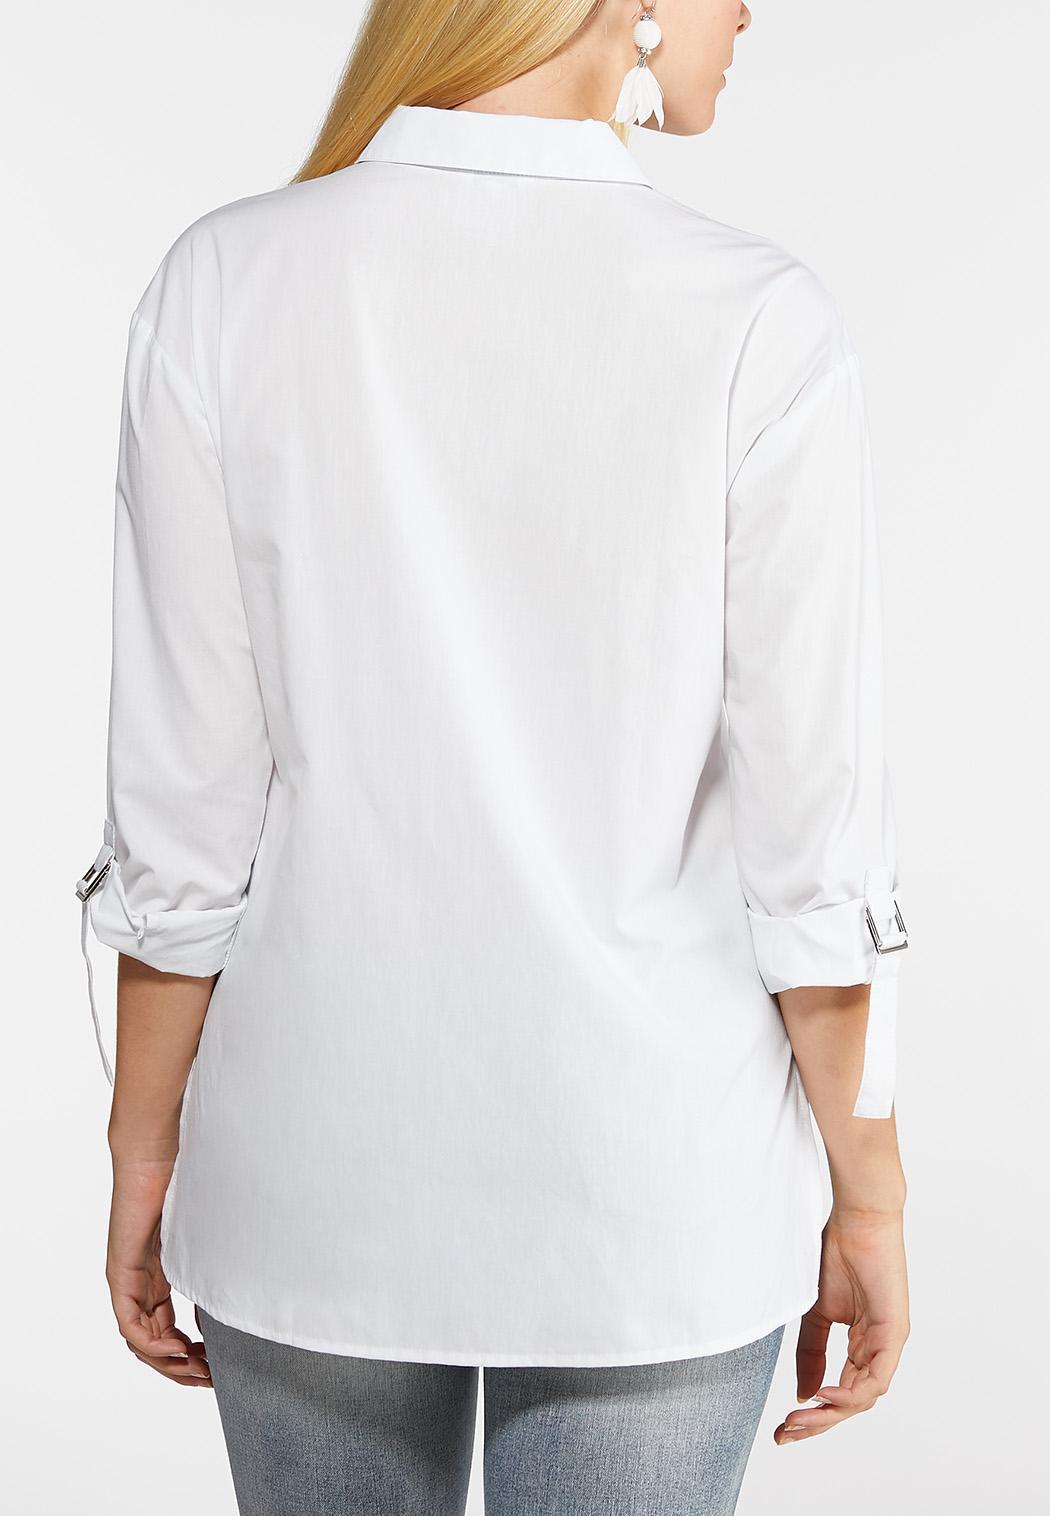 White Button Down Shirt (Item #43936372)